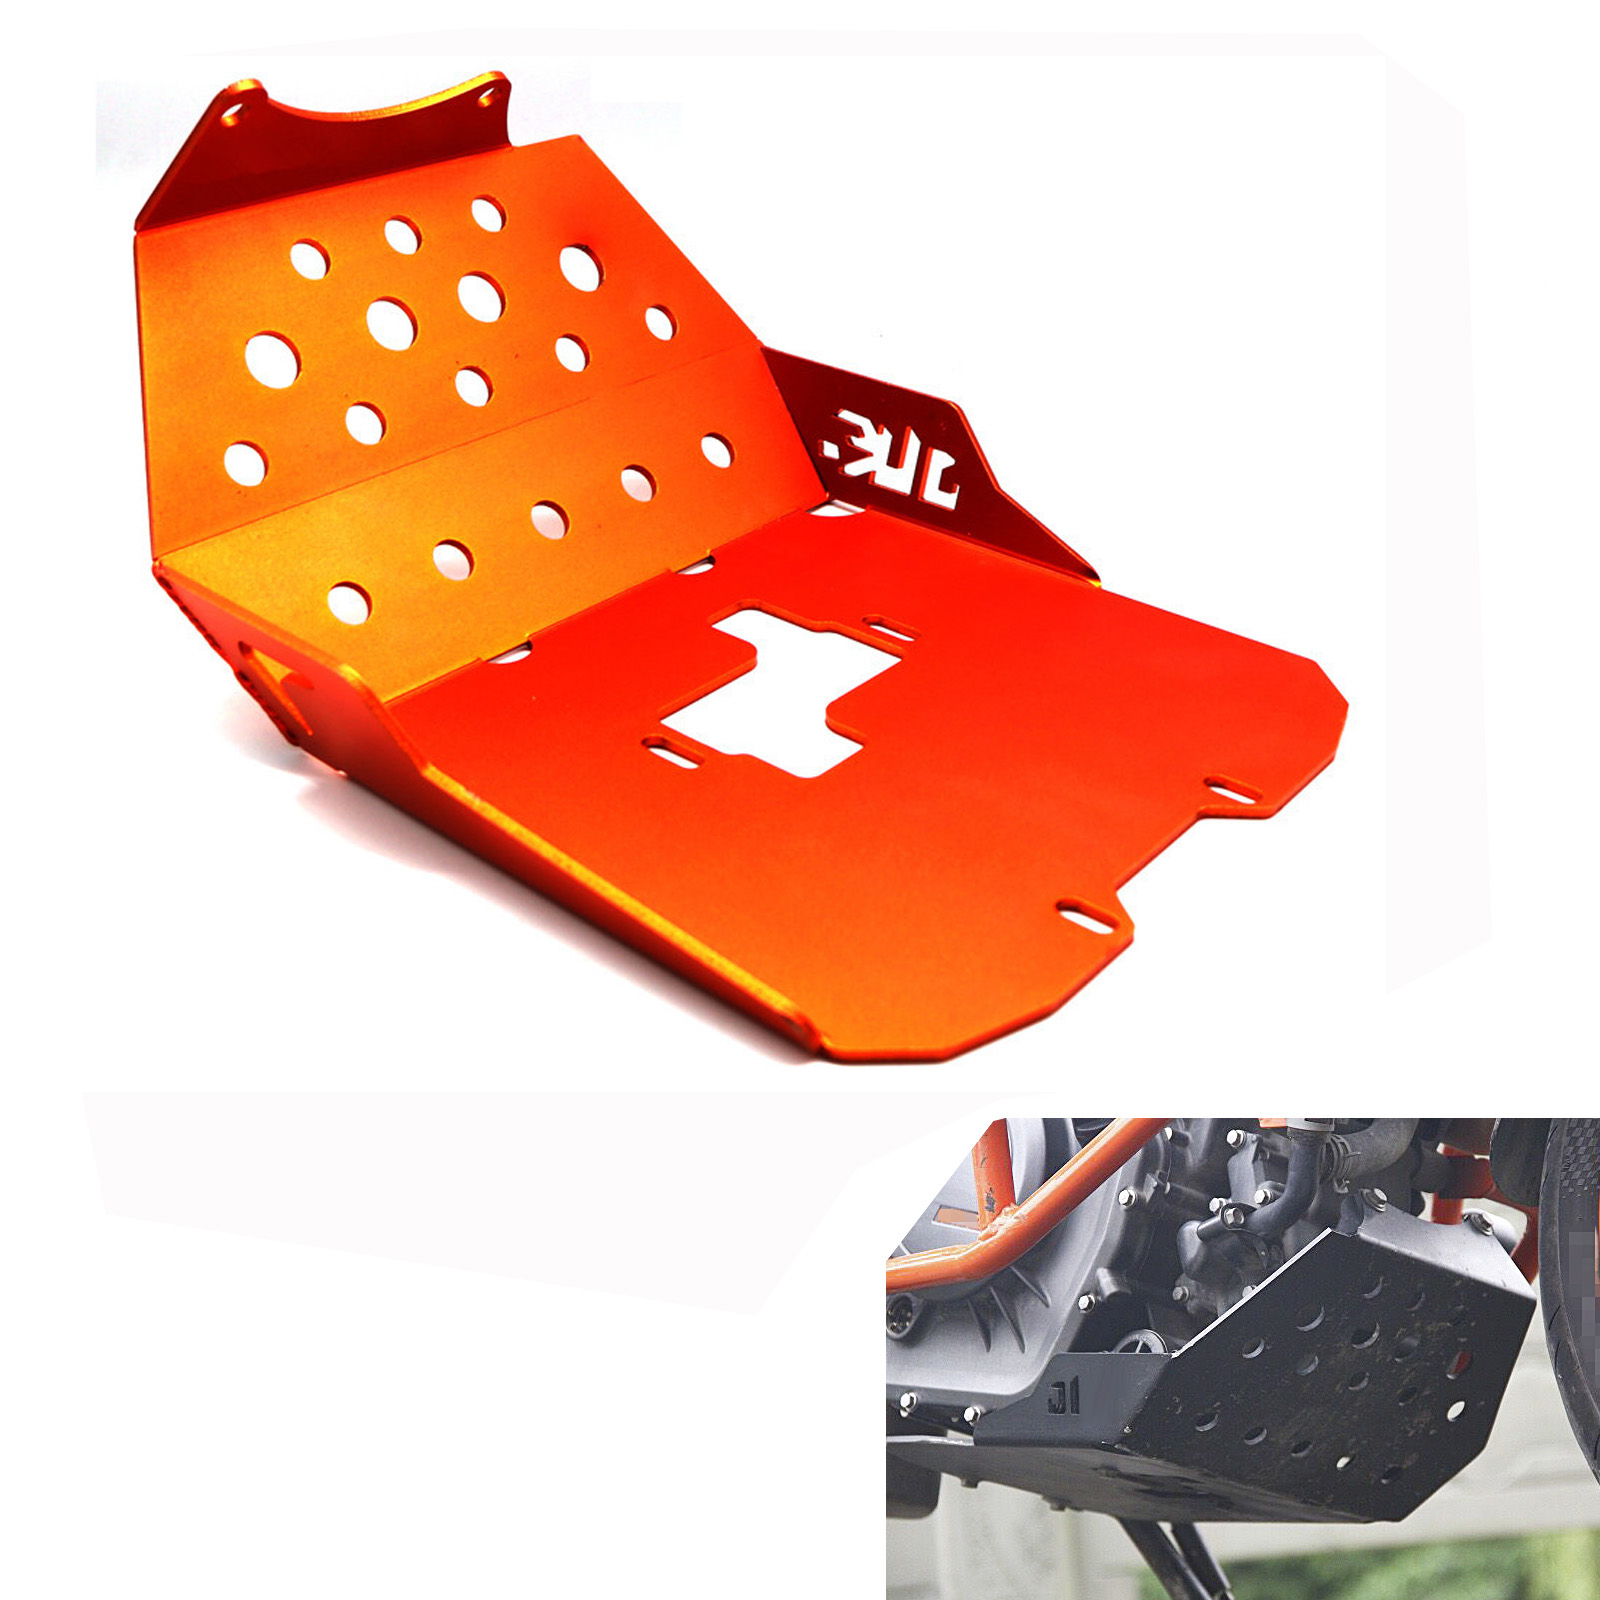 Aluminum Motorcycle Engine Guard Protector Skid Plate For KTM DUKE 390 13-16 Orange